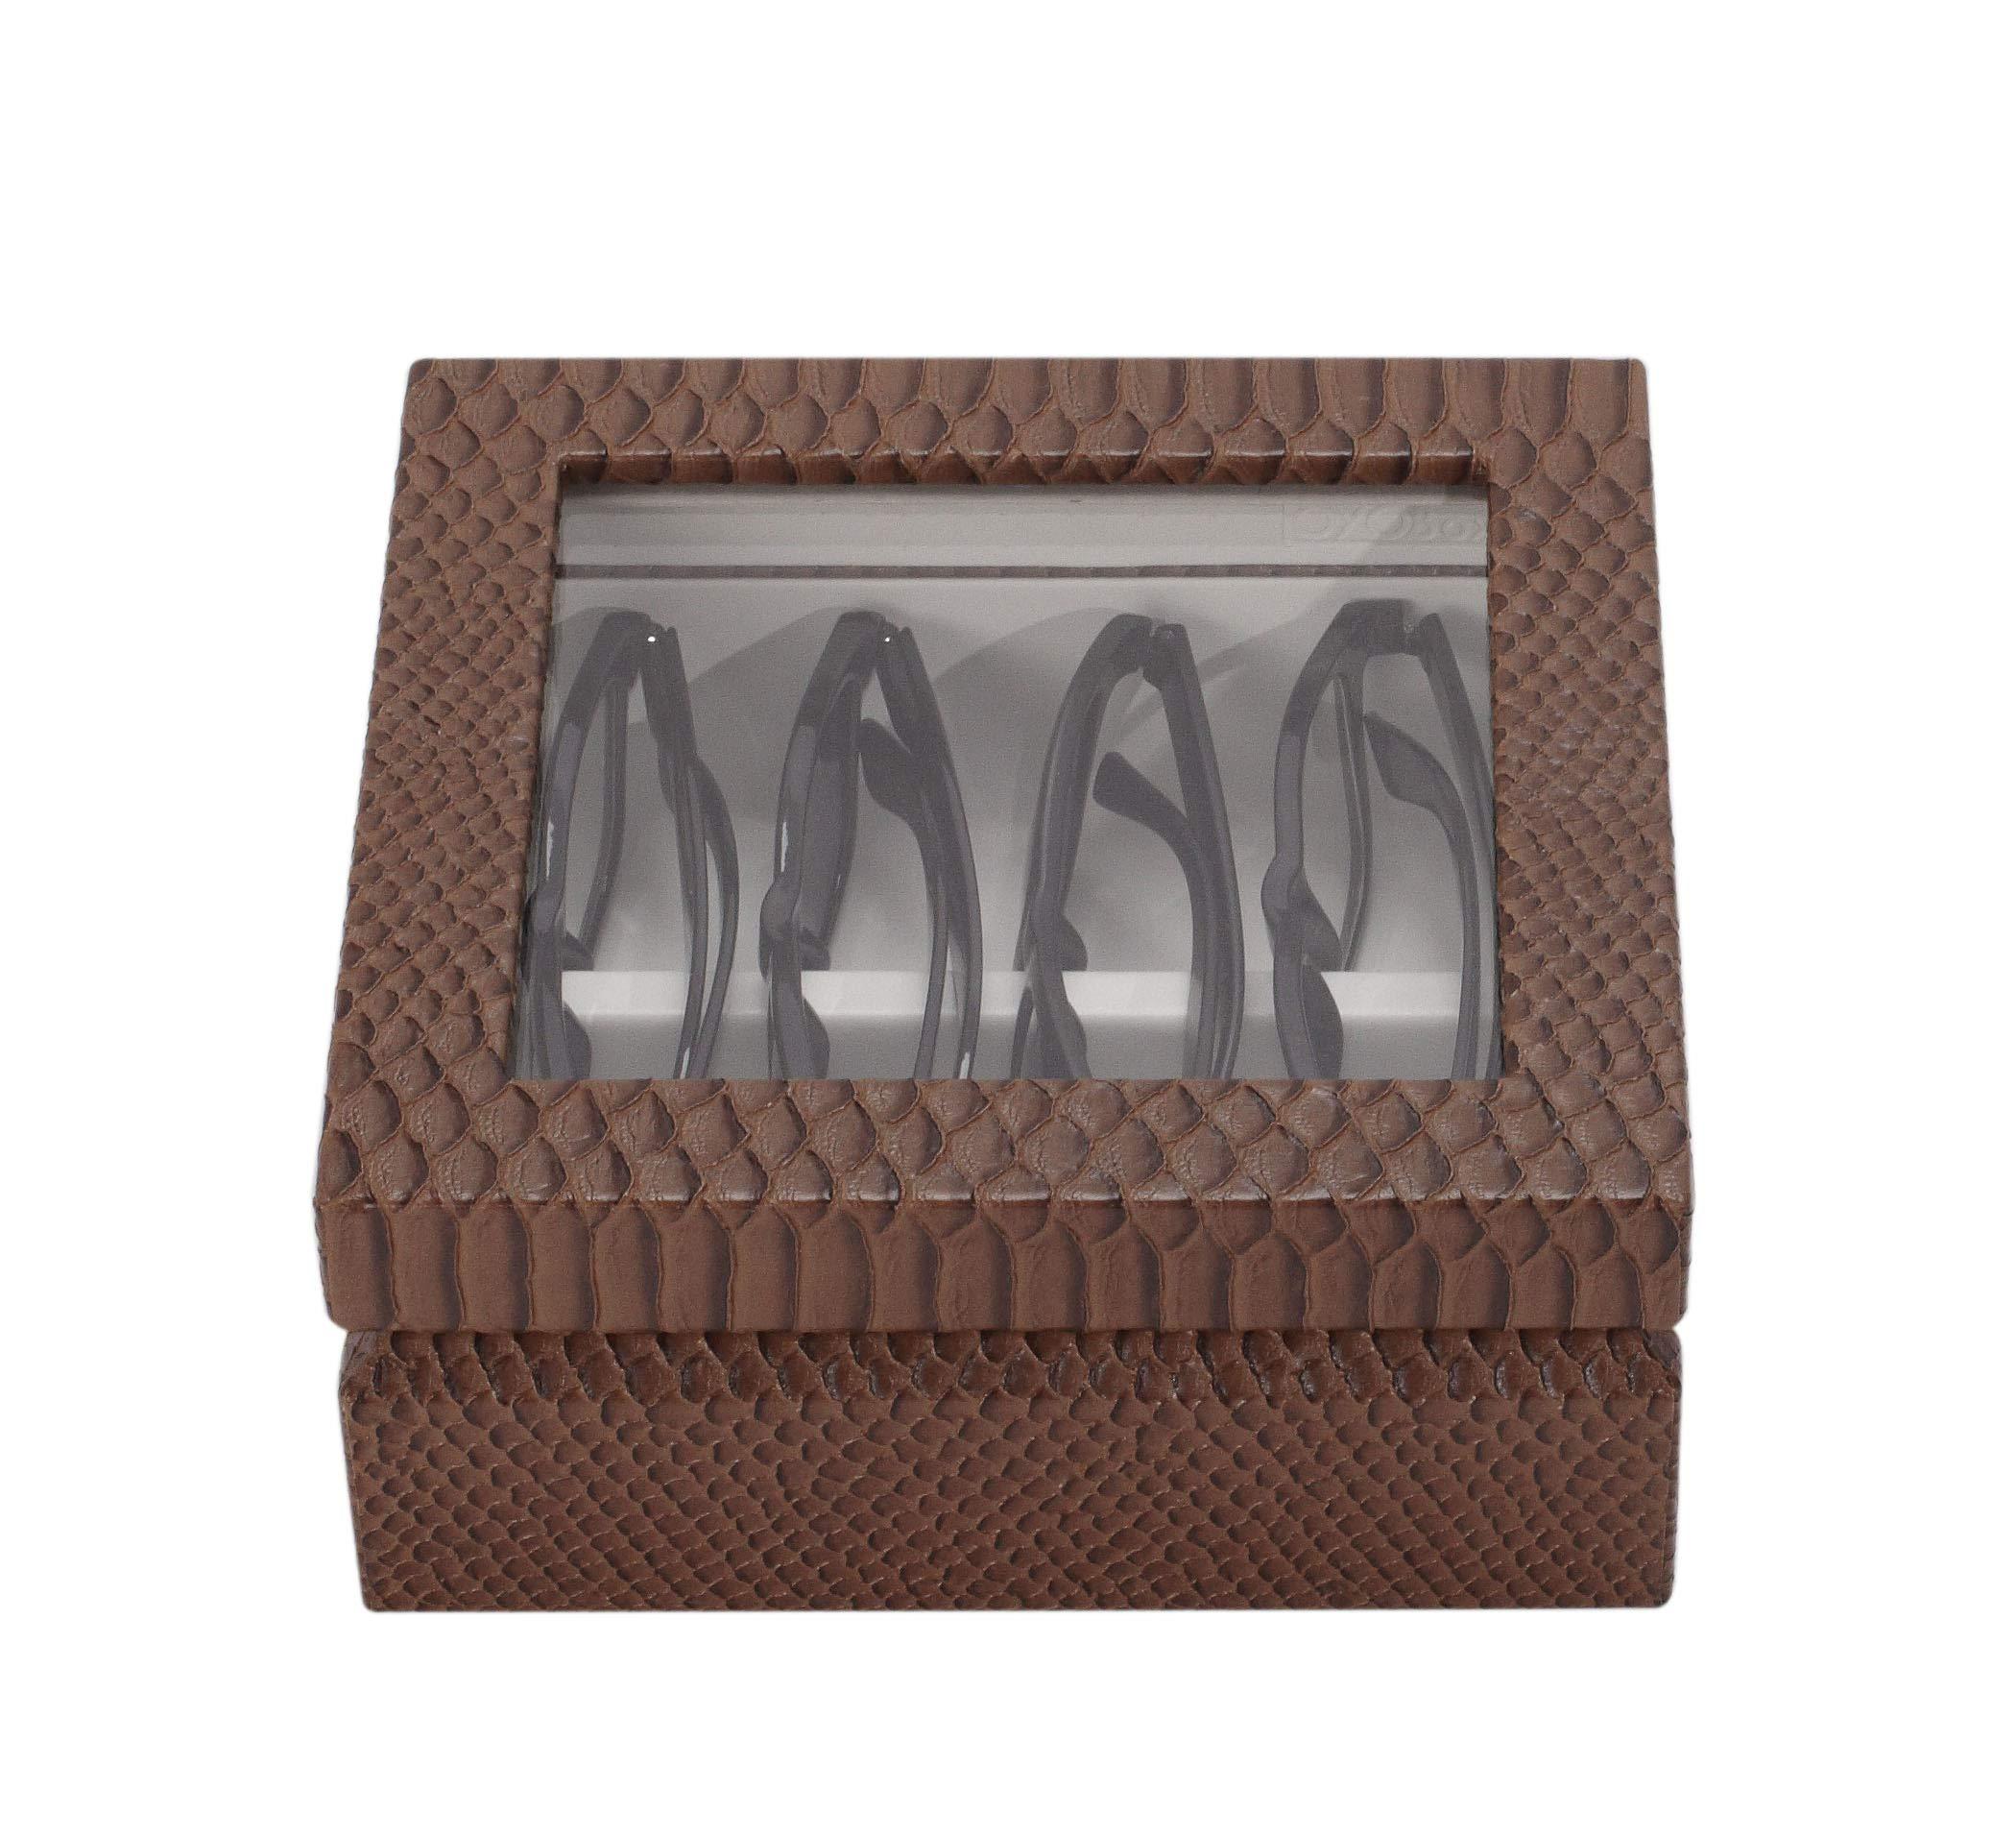 OYOBox Mini Exotic Print Luxury Eyewear Organizer, Wood Display Box for Glasses + Sunglasses (Brown Croc) by OYOBox